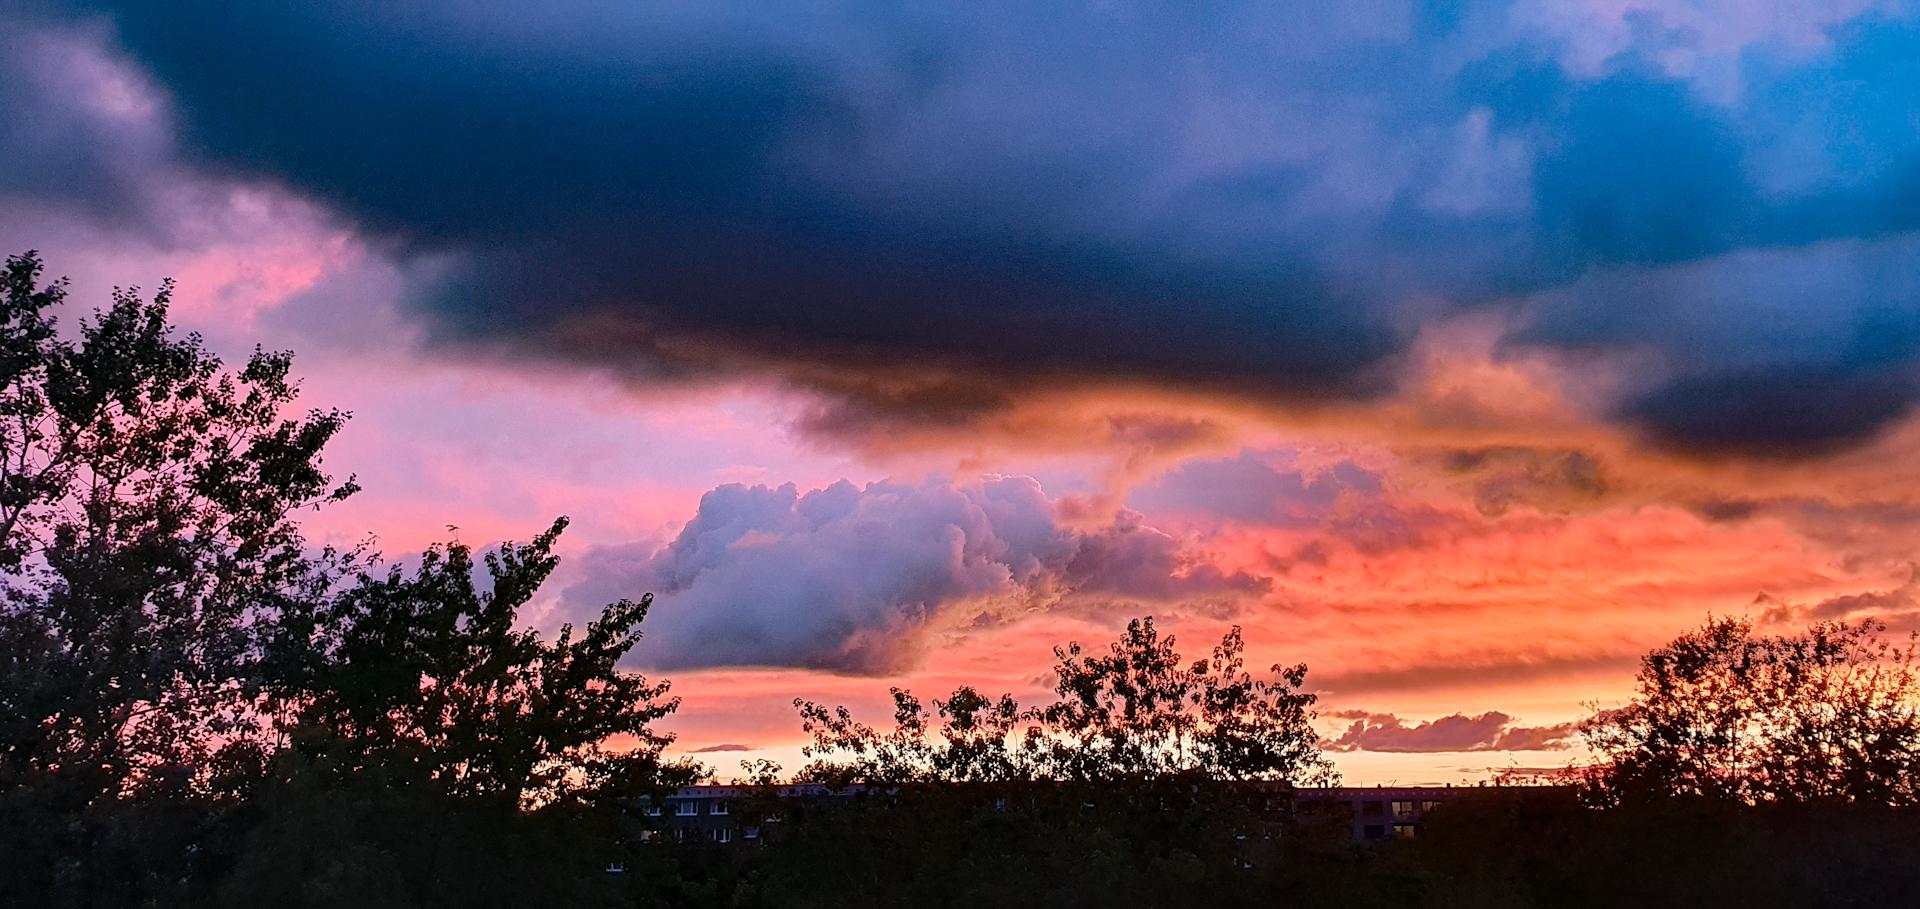 Kurz nach Sonnenuntergang in Greifswald